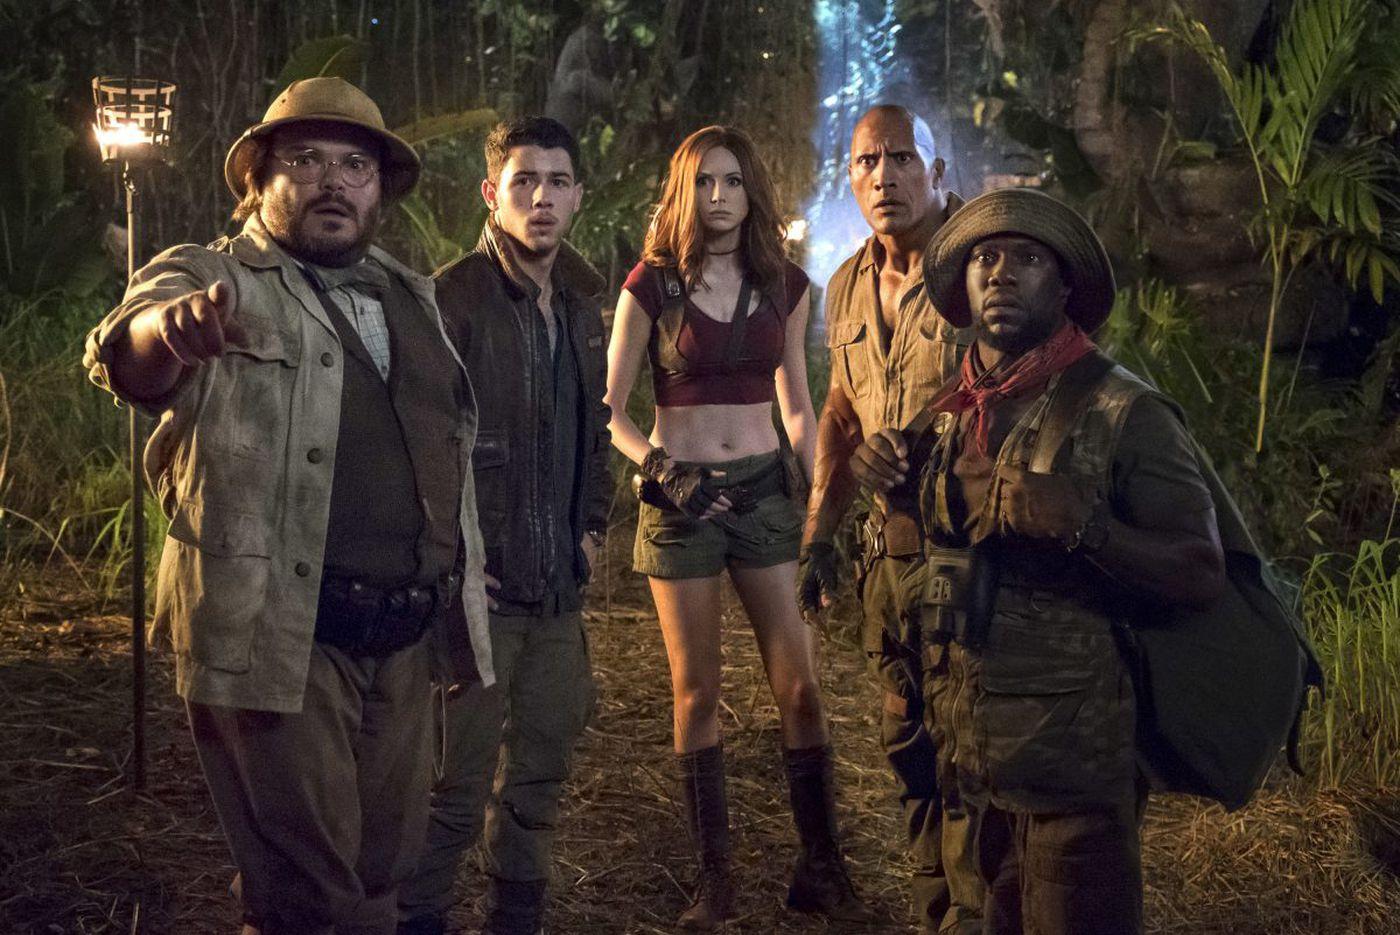 'Jumanji: Welcome to the Jungle': Whoa, a reboot that isn't lame?